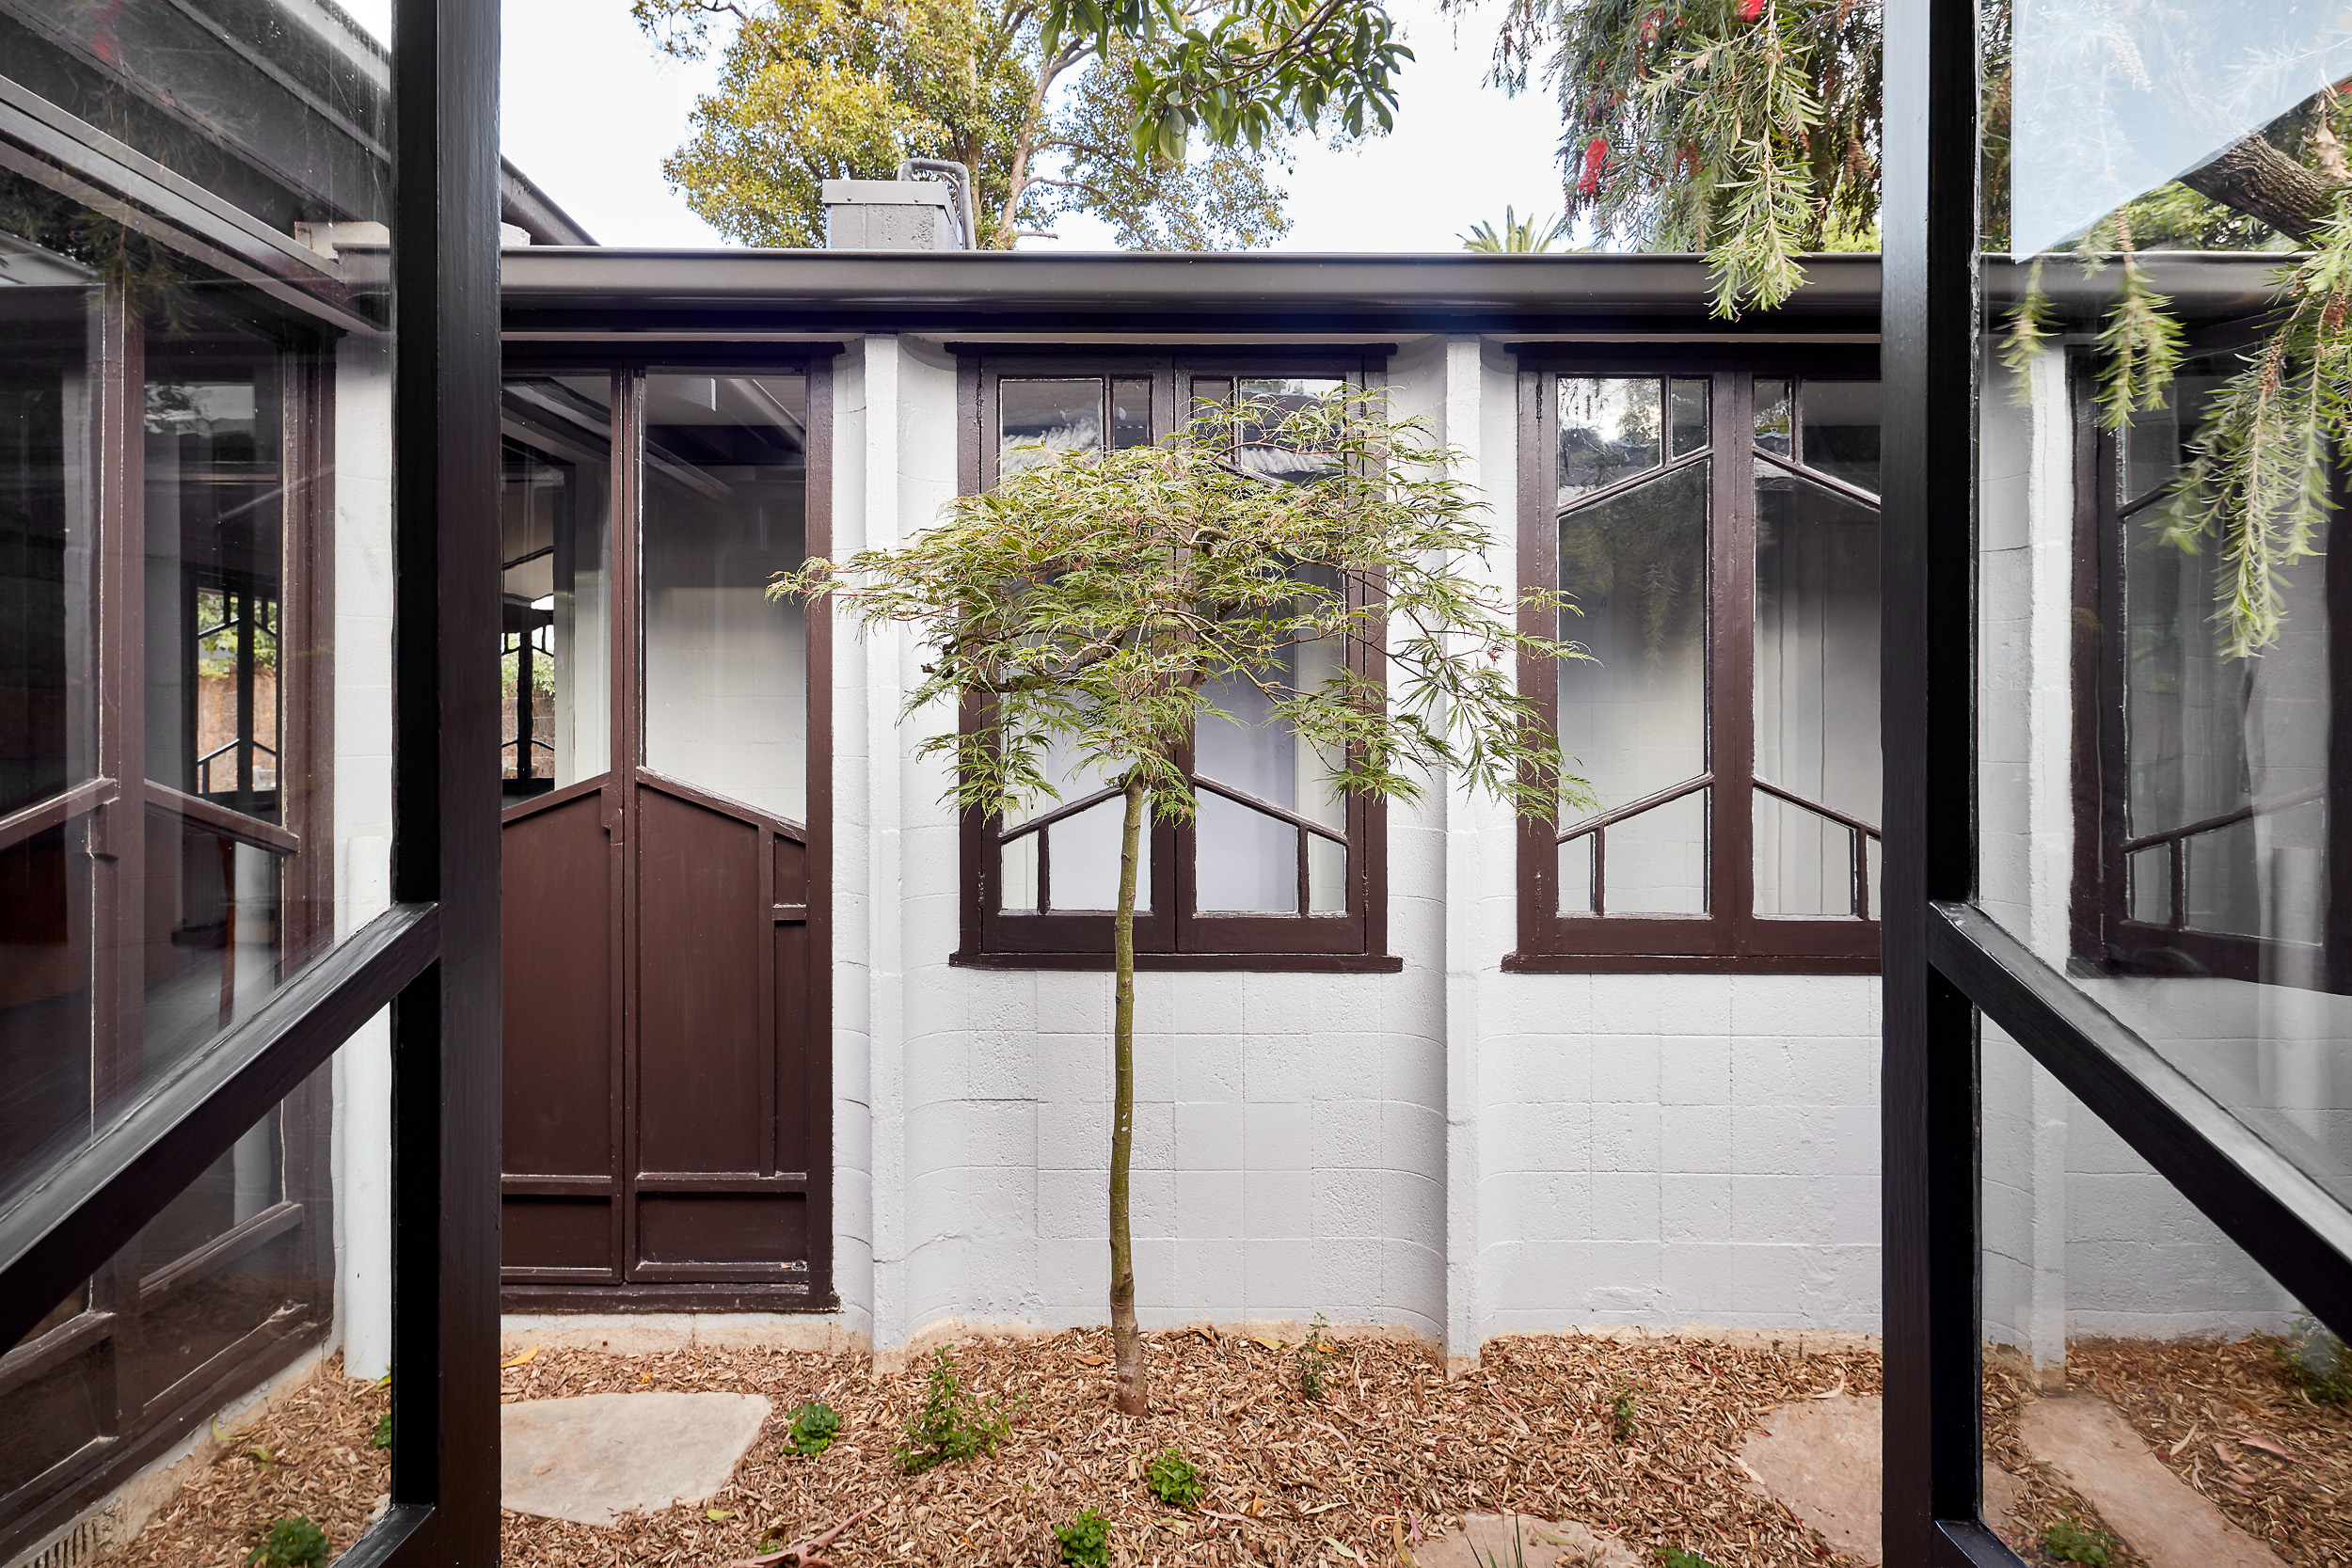 Burley Griffin House Toorak Renovation 2018